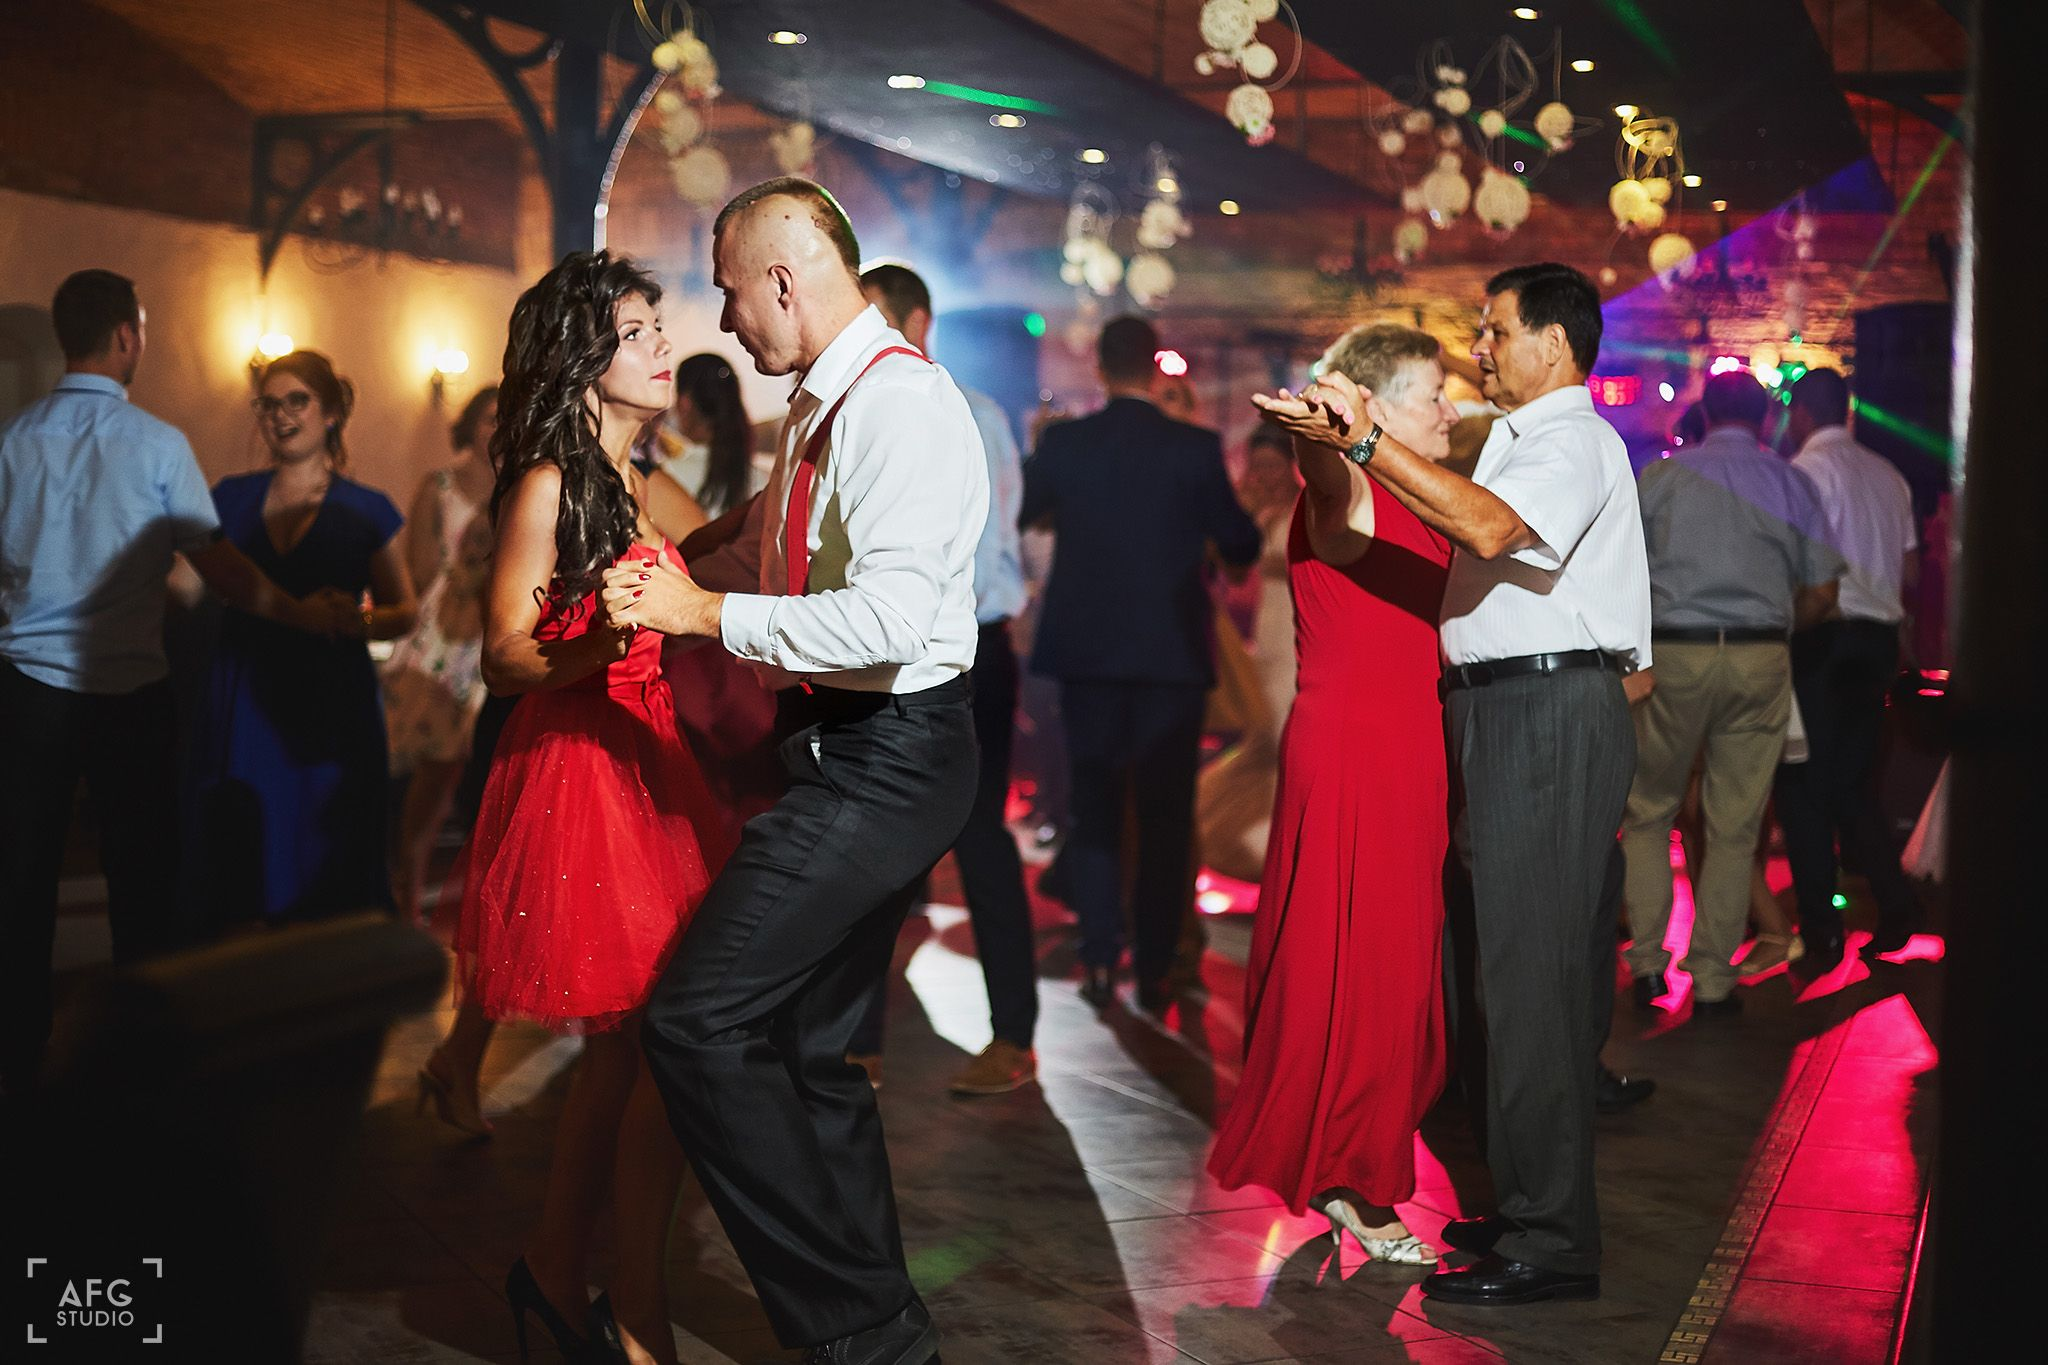 taniec, parkiet, zabawa weselna